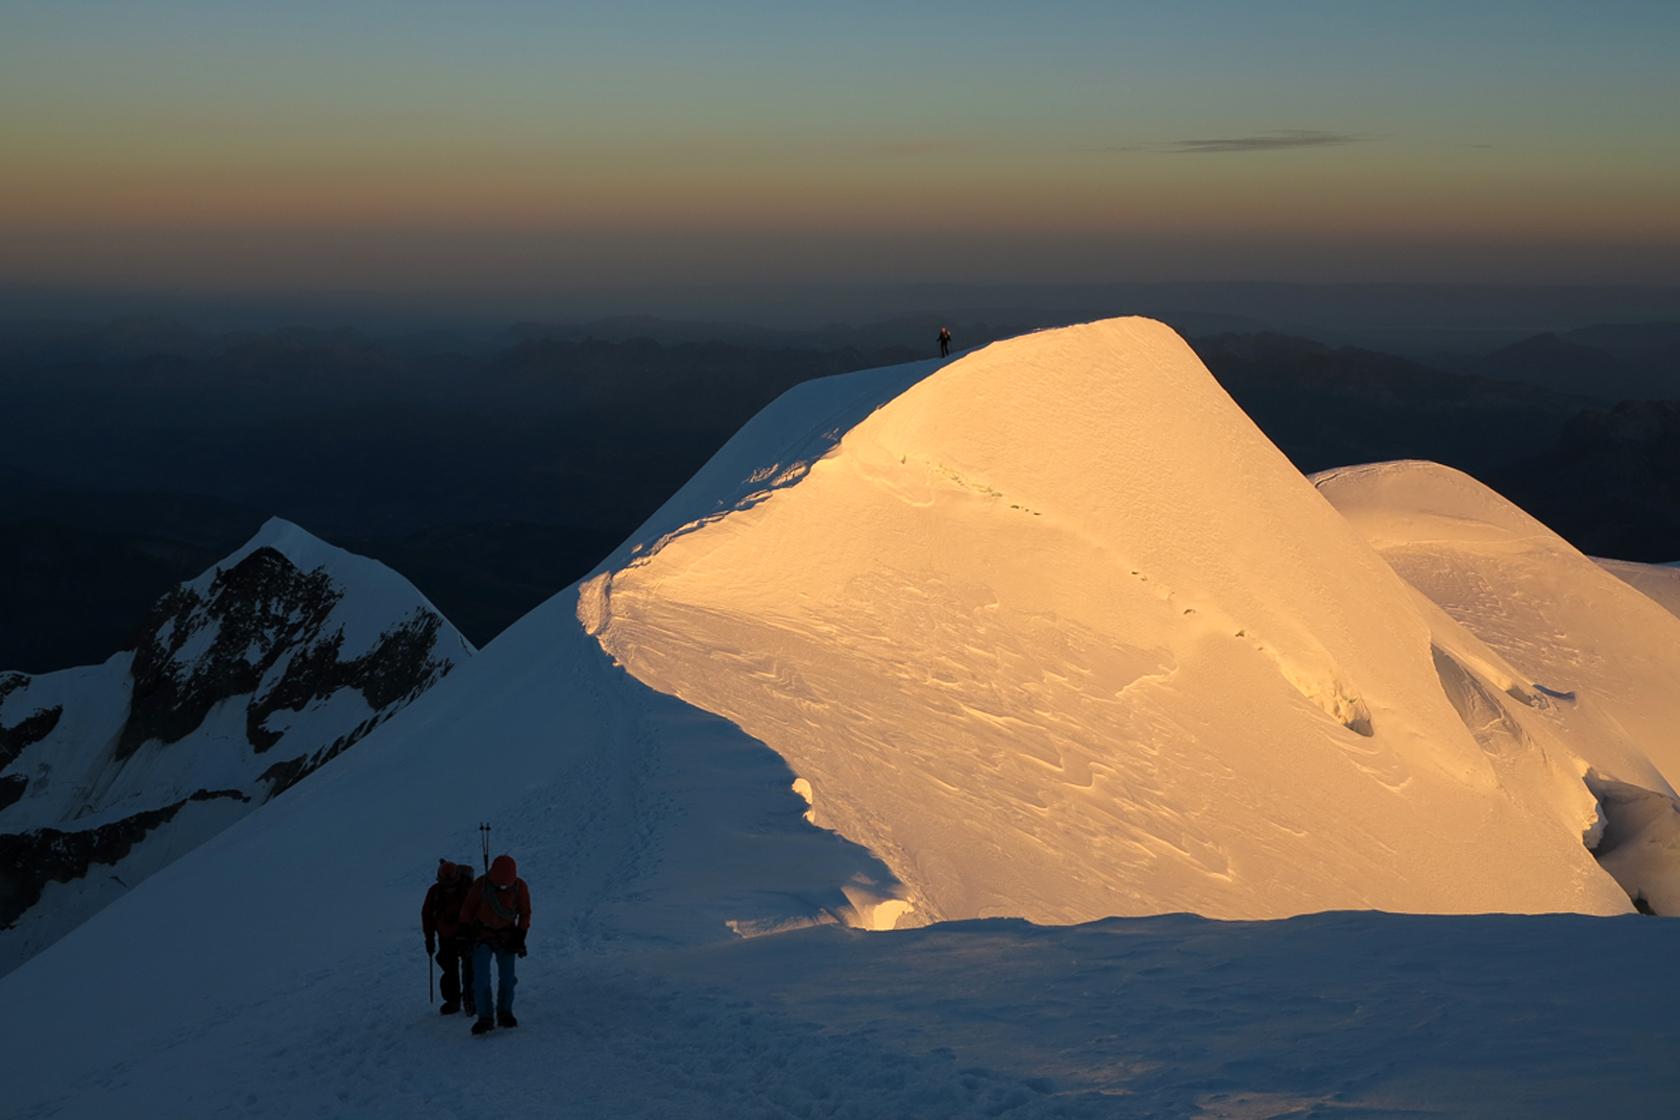 Monte Bianco quota 4810